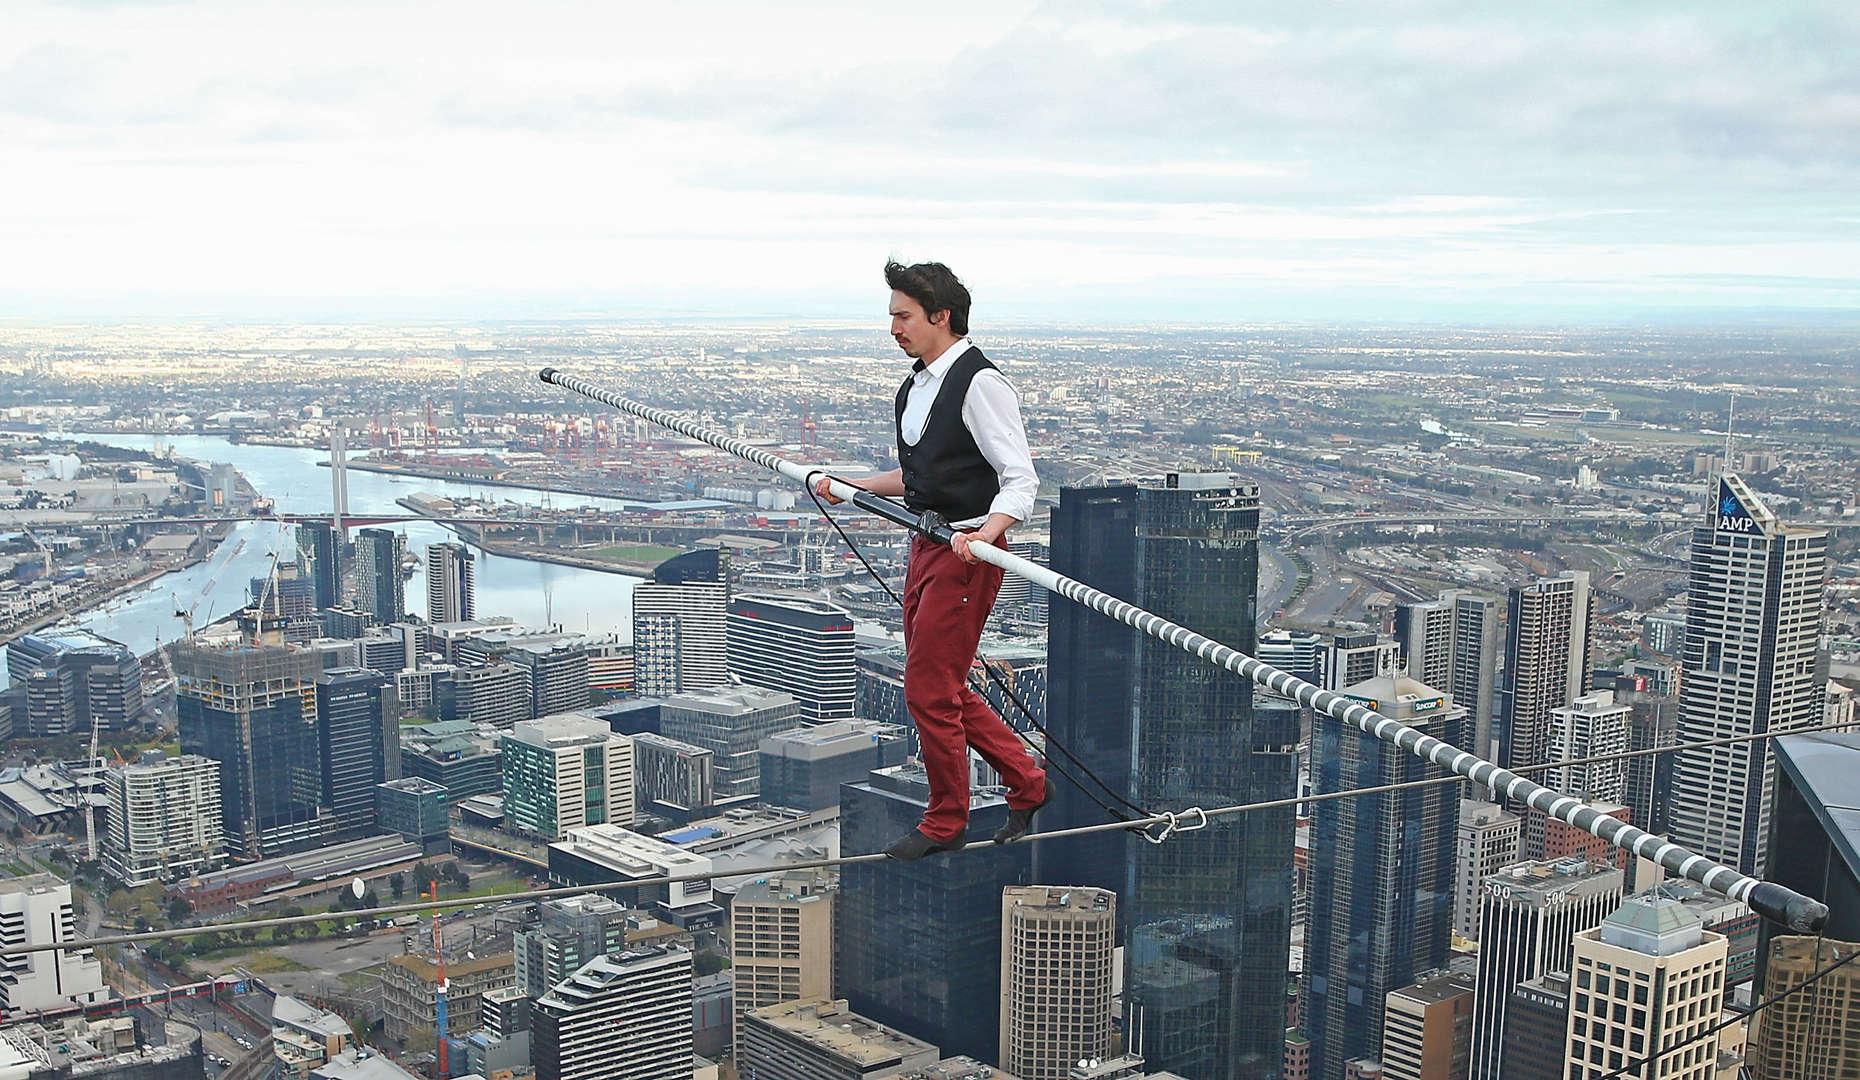 Living on the edge: Memorable death-defying stunts